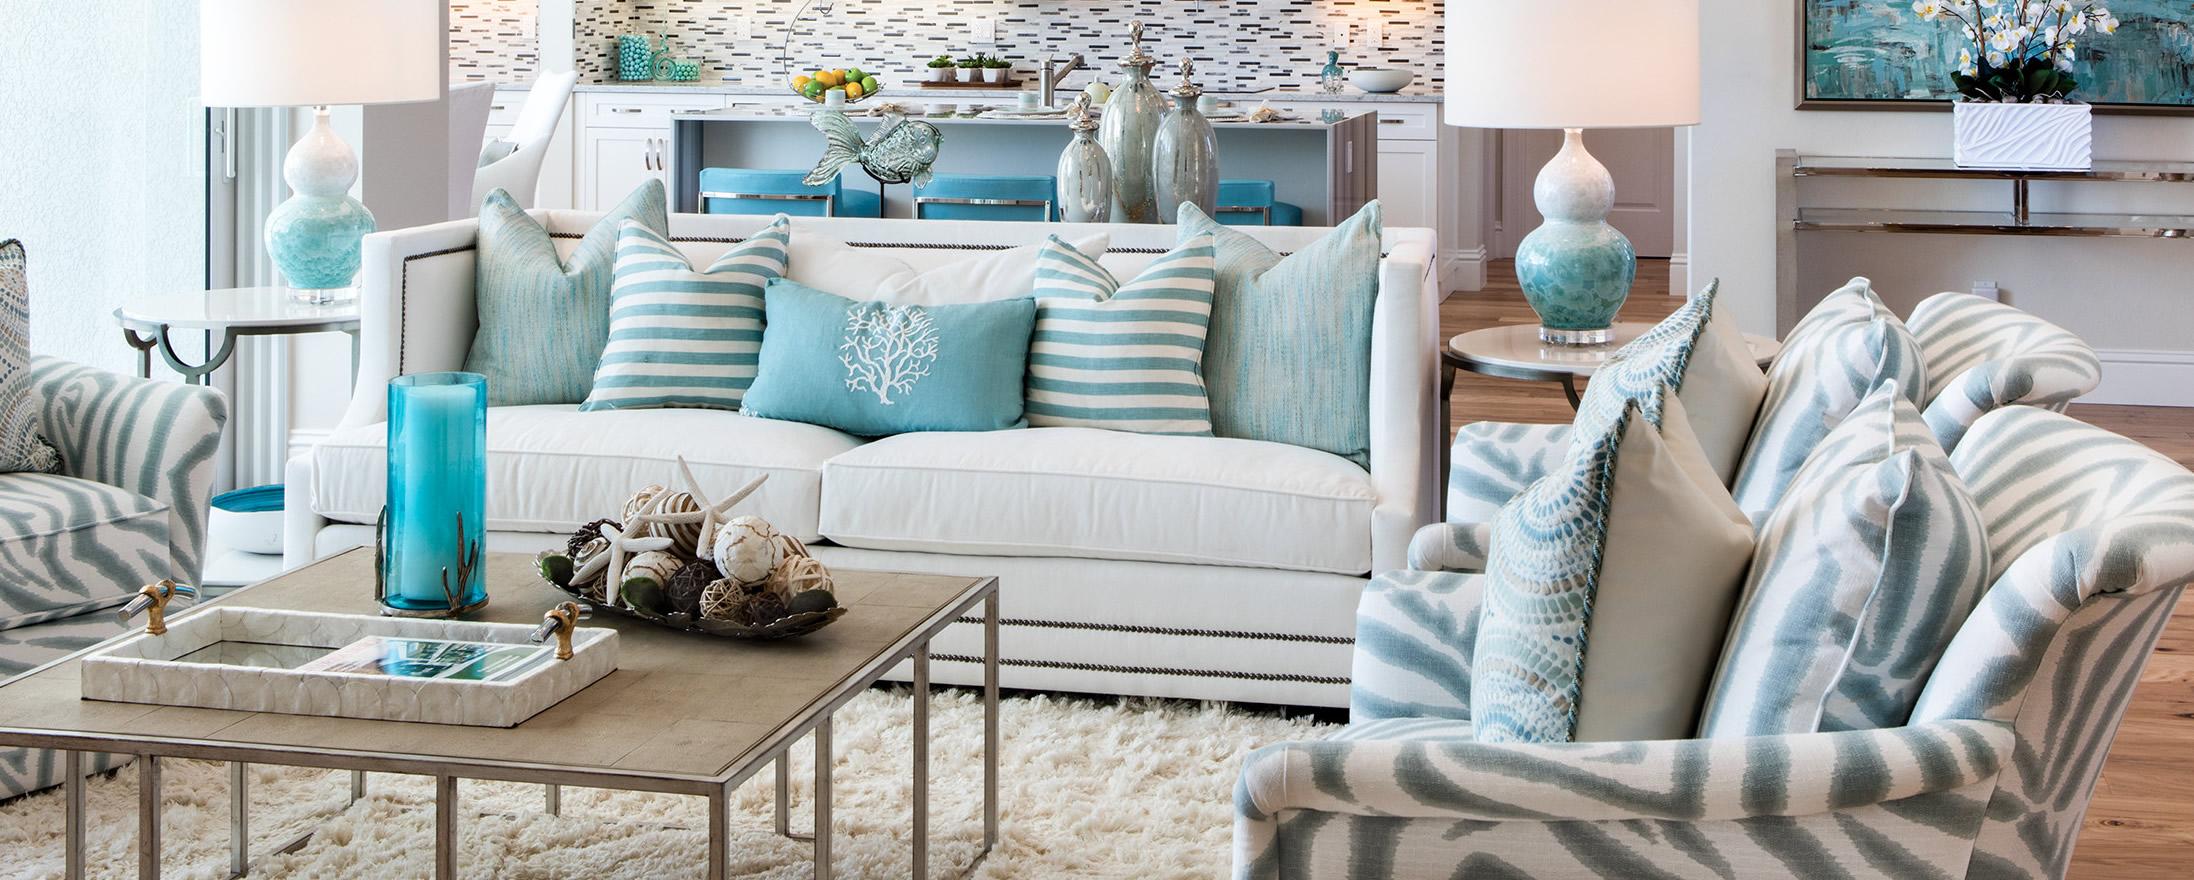 Complimentary Design Services : Interior Design : Room Planner ...